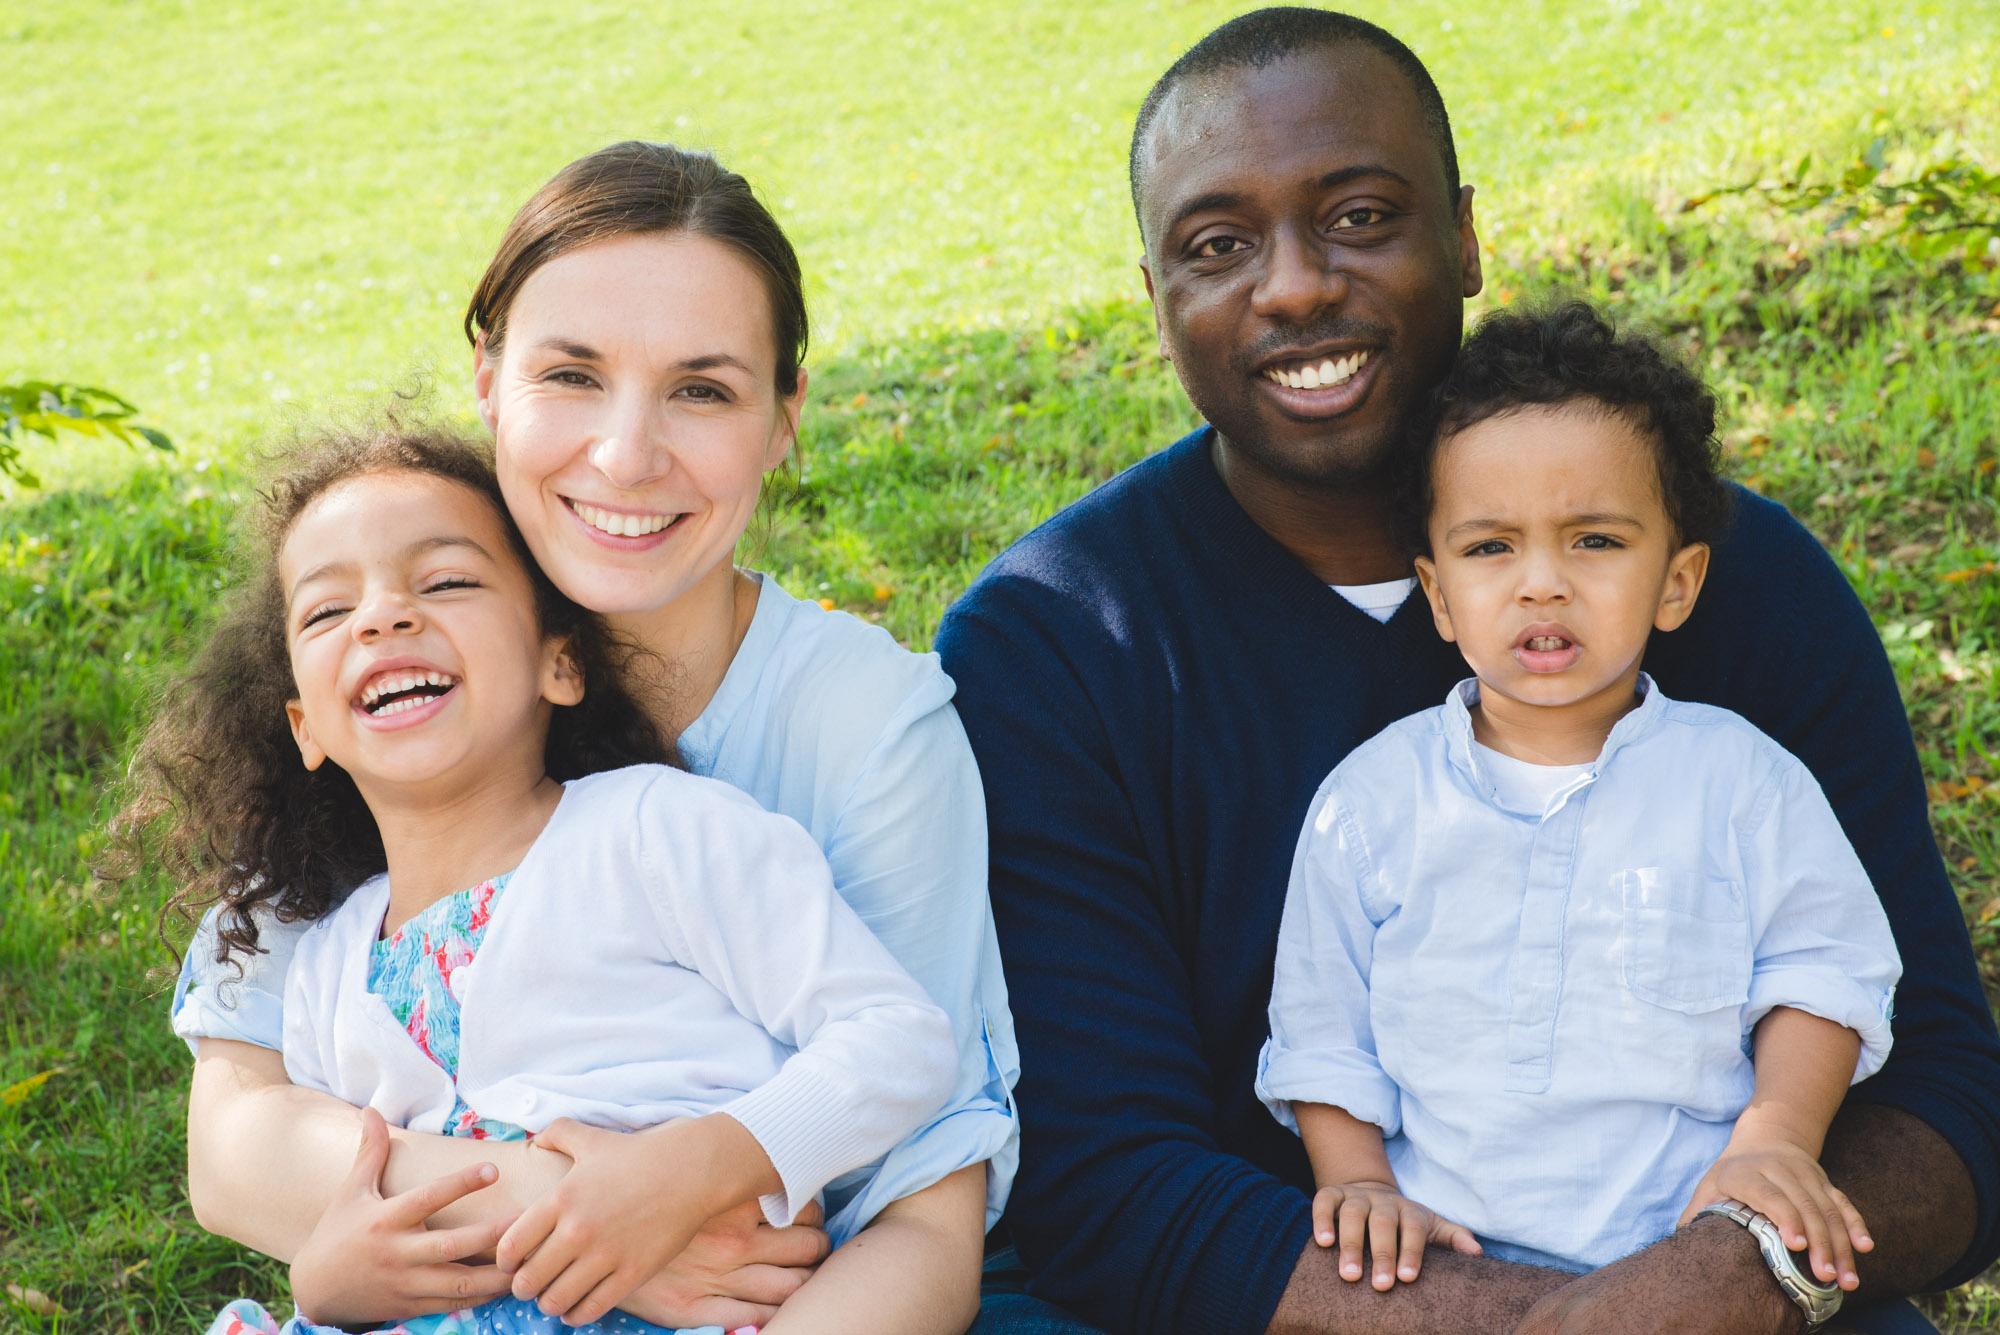 Familienfotos Spätsommer